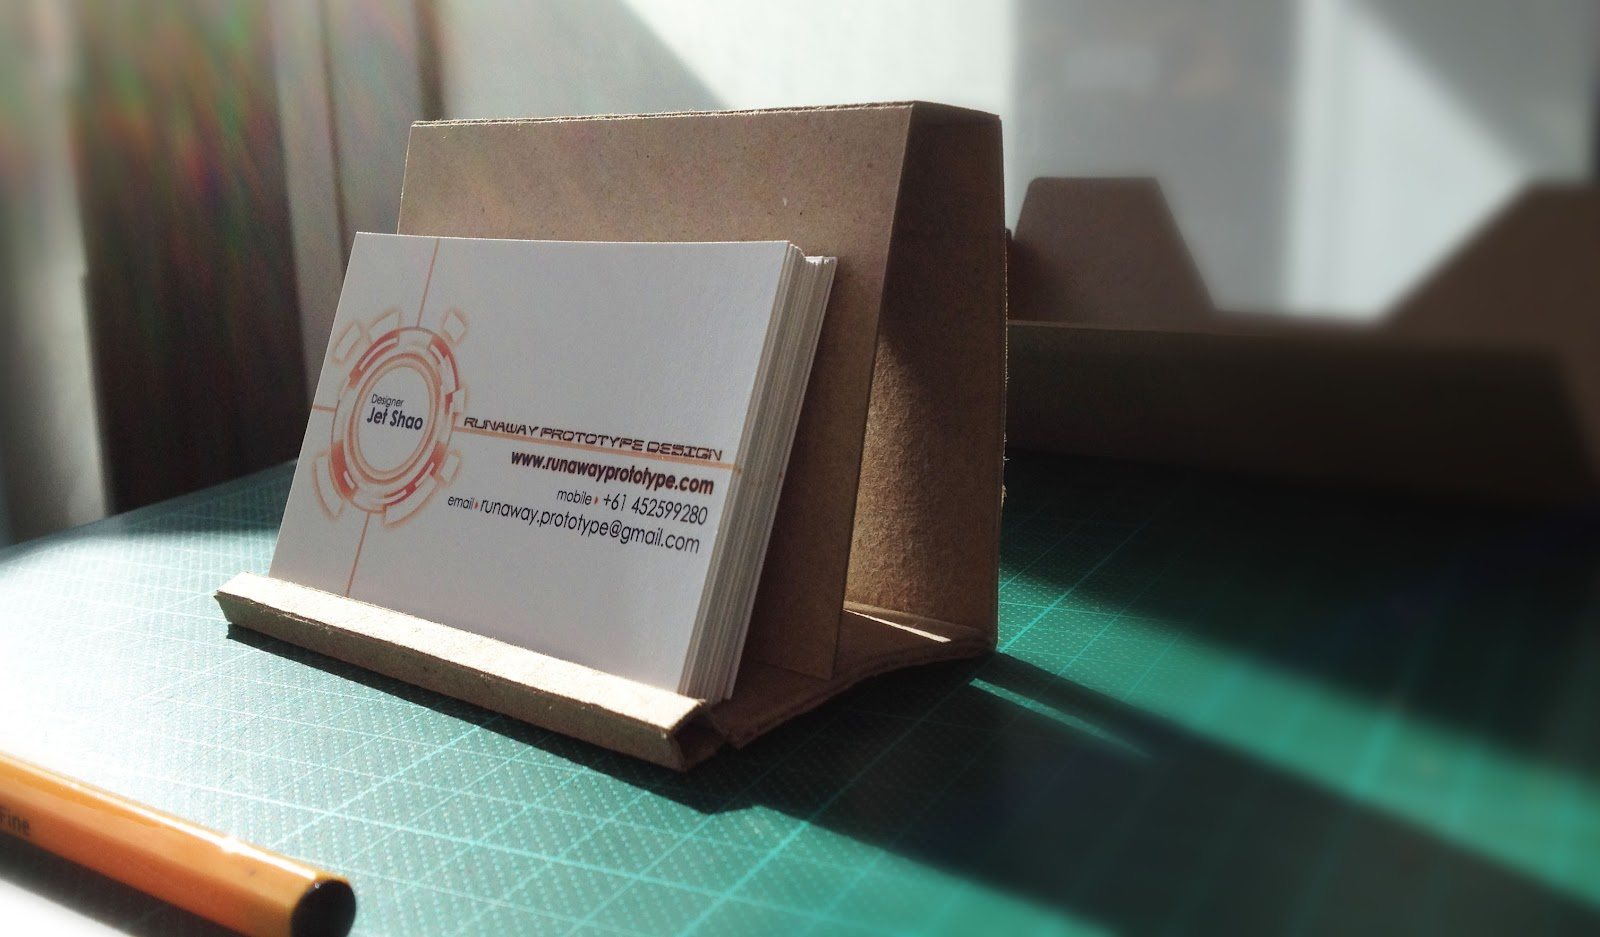 Runaway Prototype Design Cardboard Business Card Holder